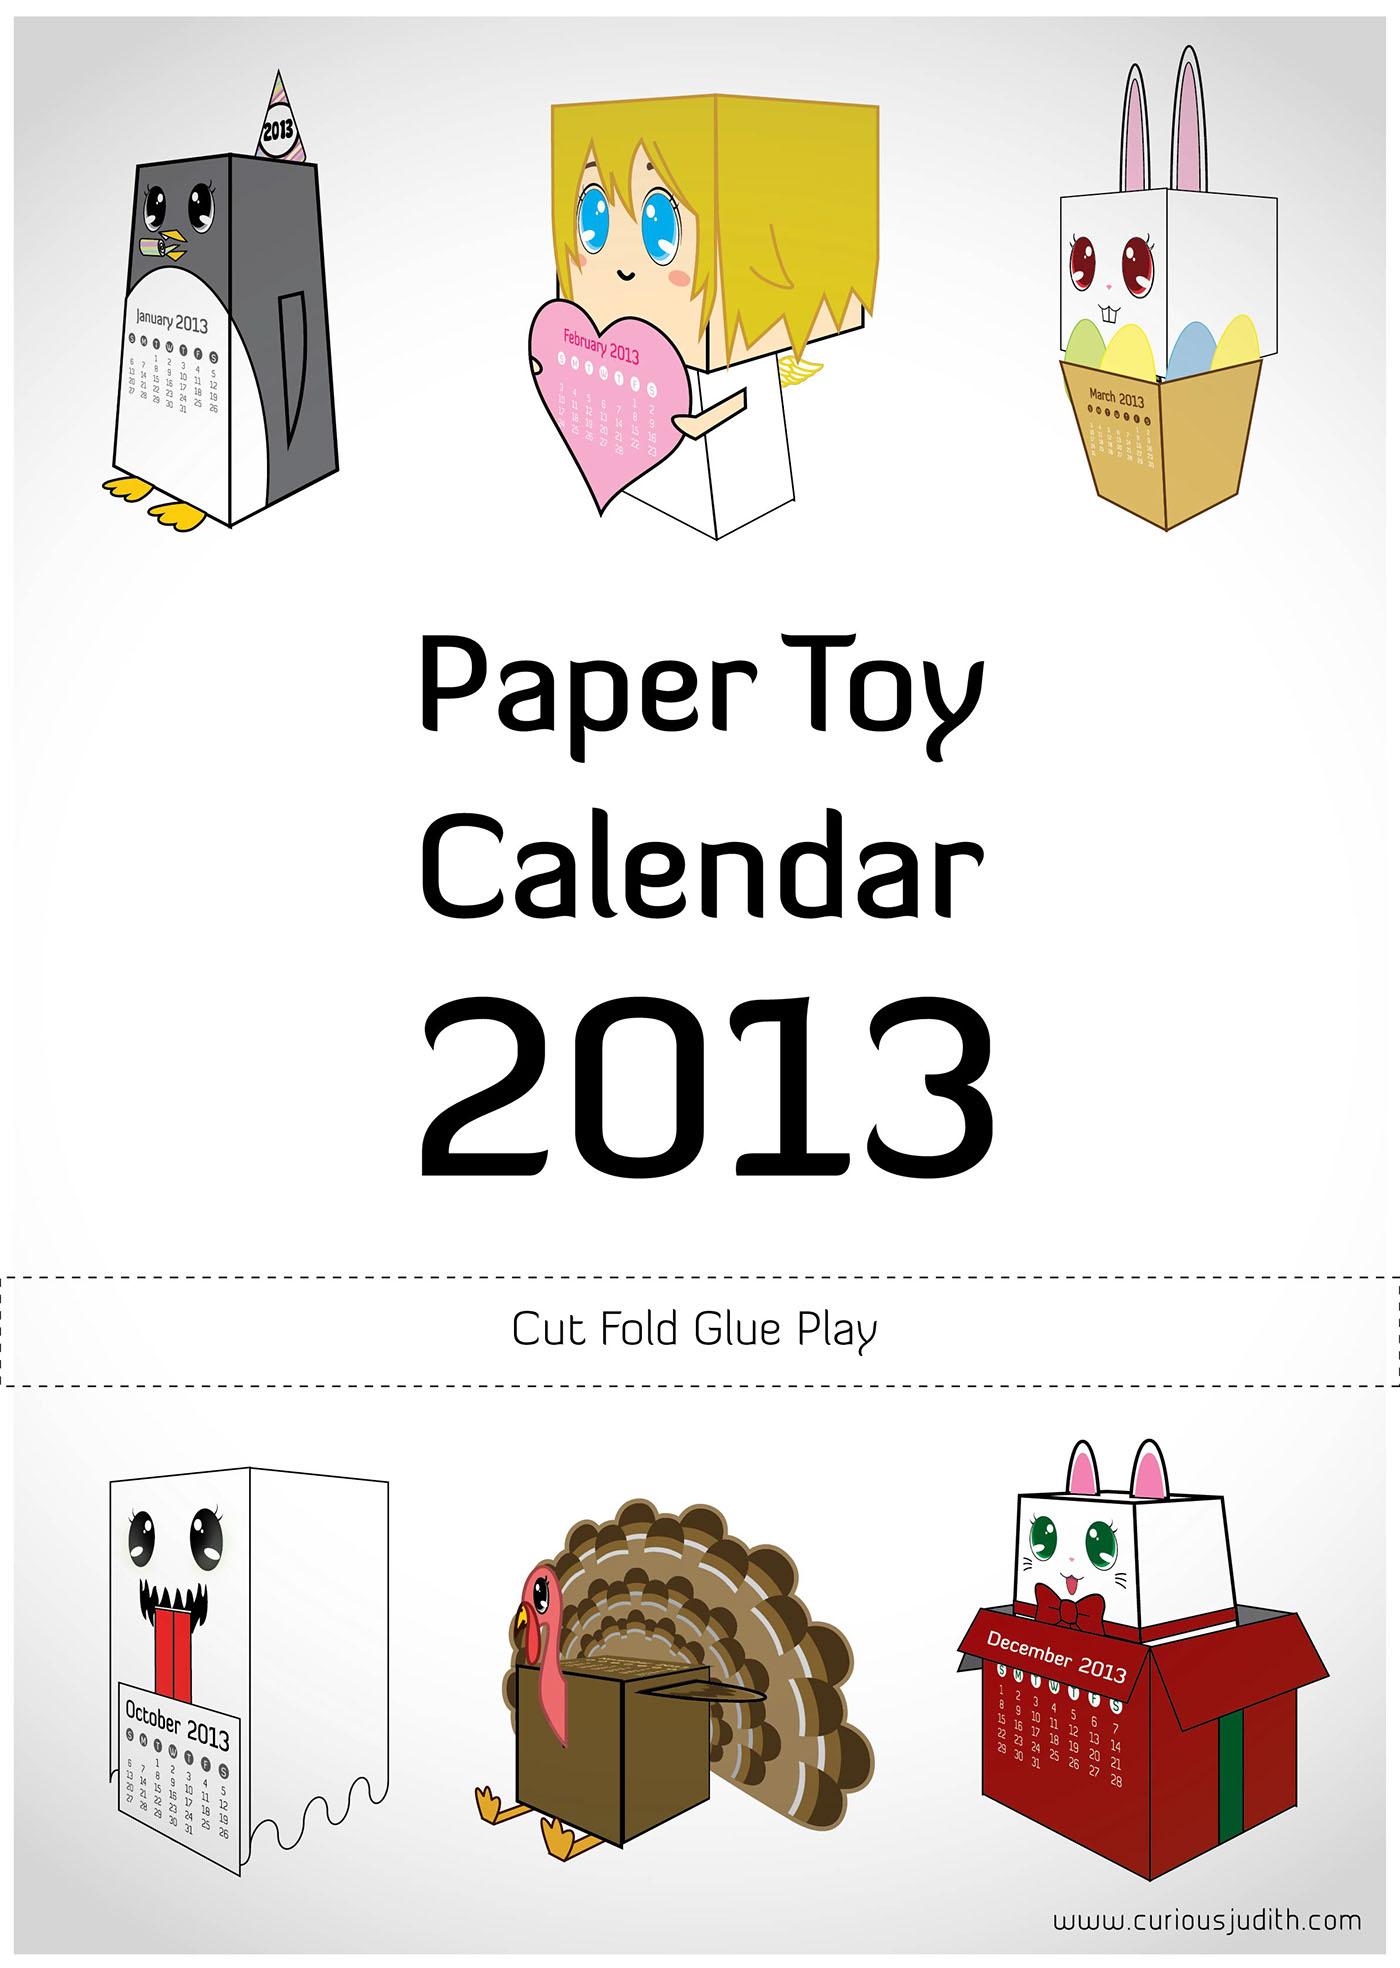 Character Design Job Singapore : Paper toy calendar on behance